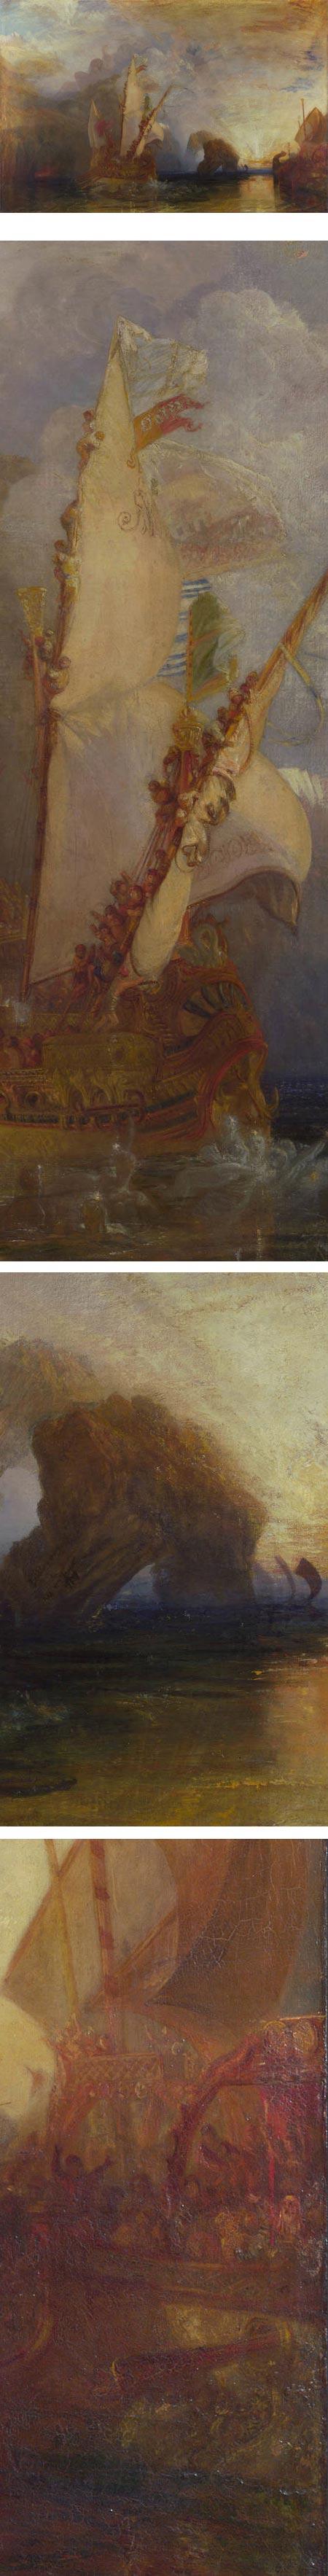 Ulysses deriding Polyphemus, JMW Turner